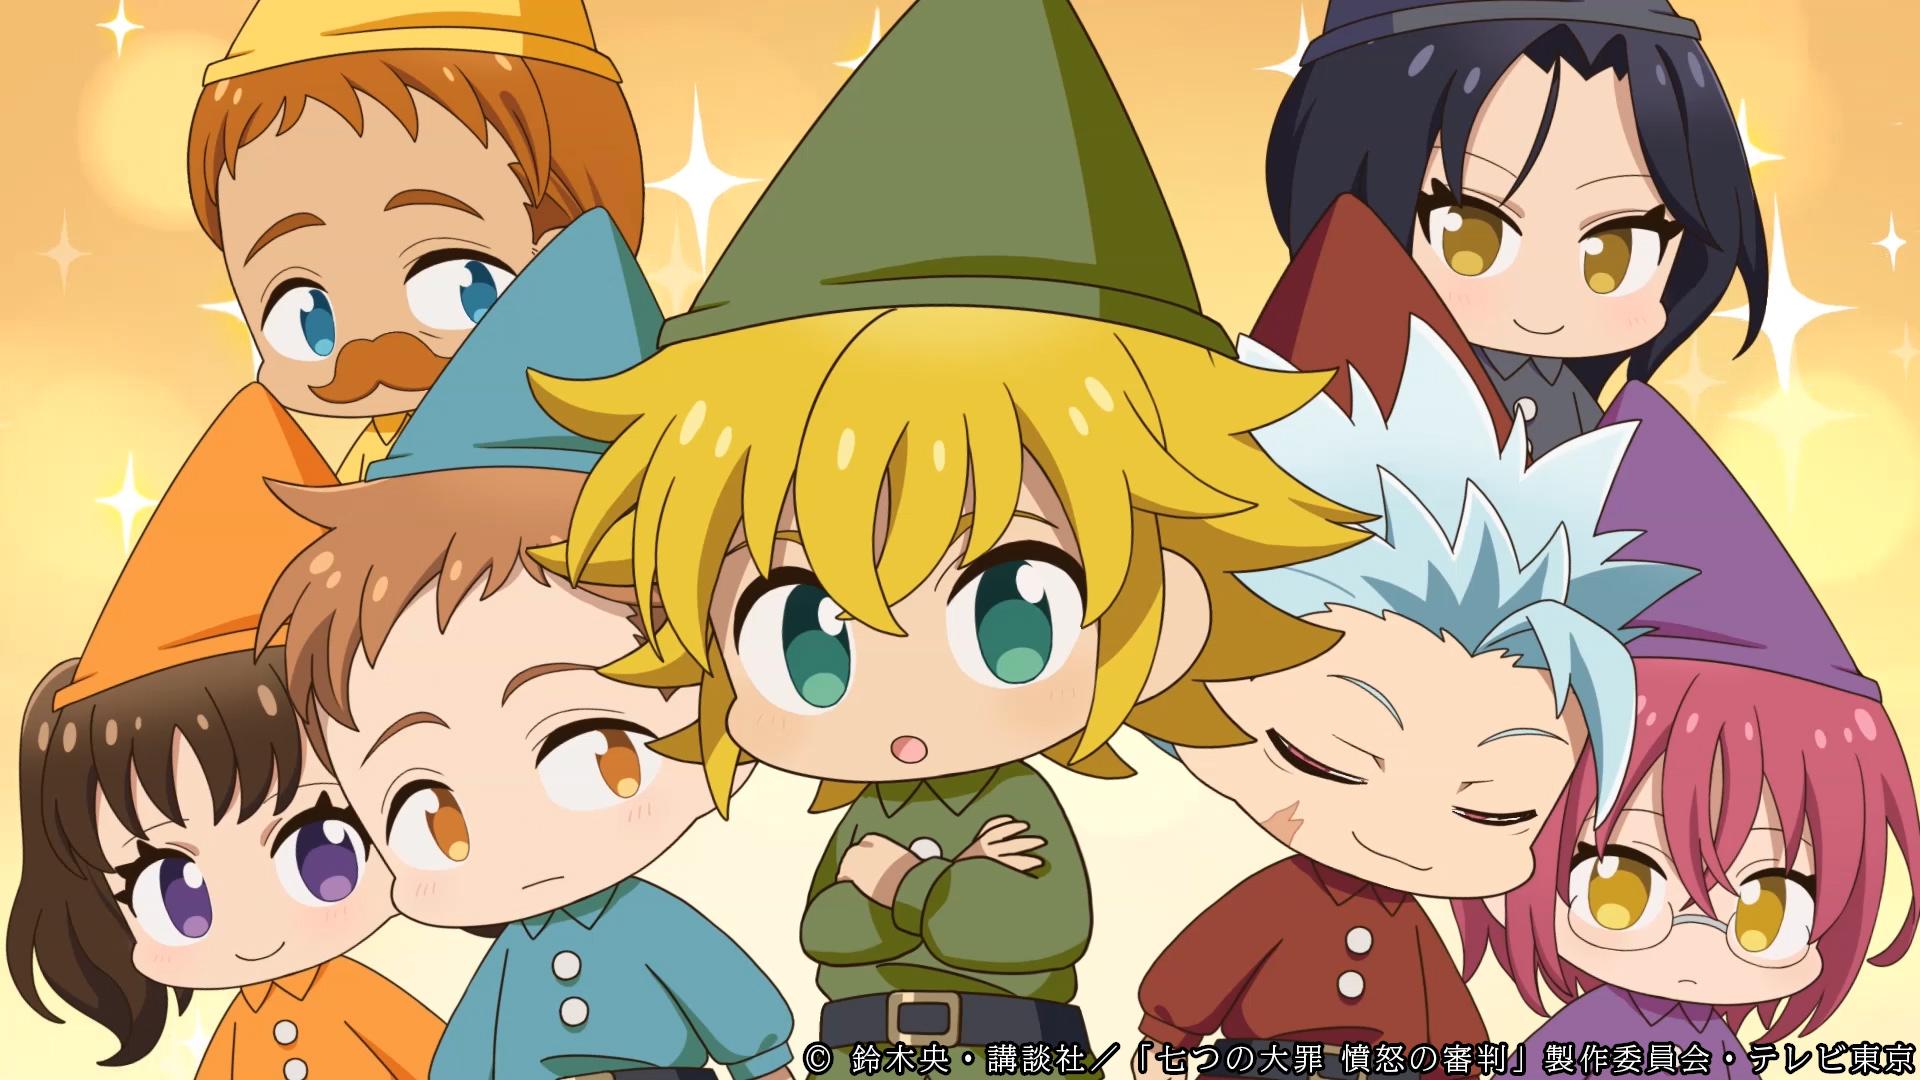 TVアニメ「七つの大罪」パロディー風ミニアニメ「劇団七つの大罪」が公開!リアル・ホークのグリーティングも開催決定